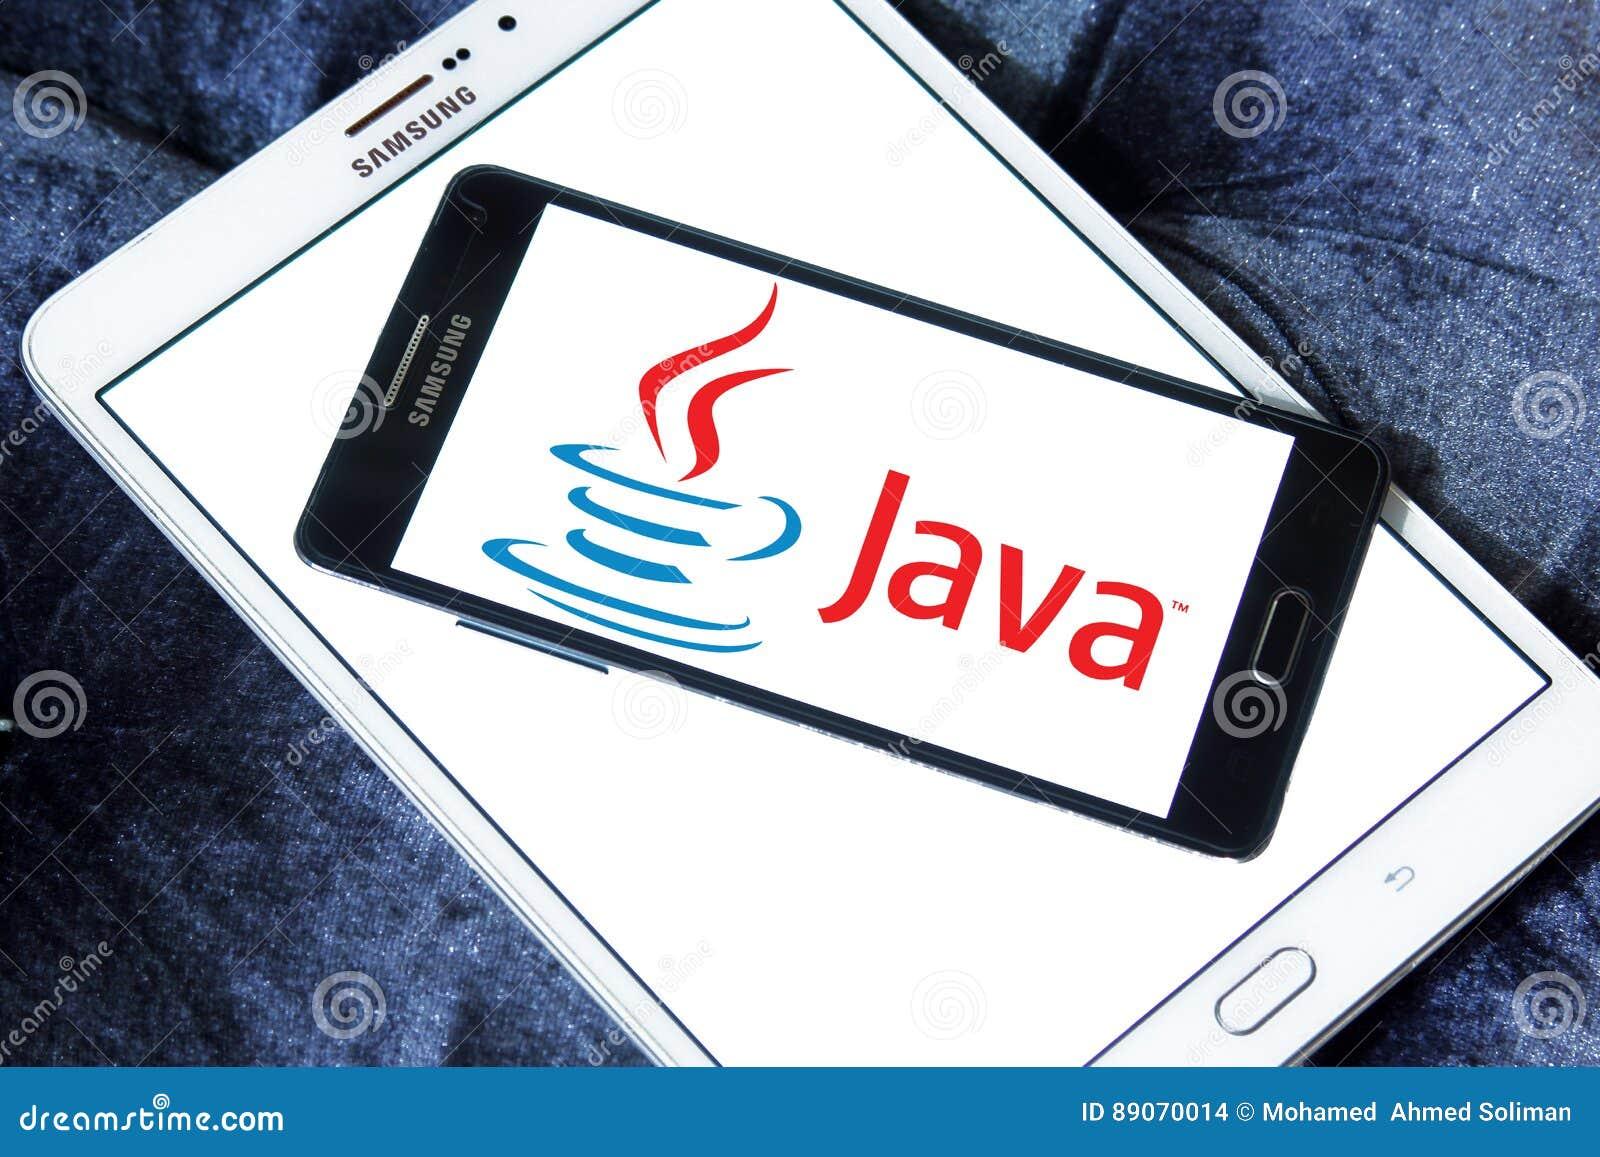 Java logo editorial stock image  Image of programming - 89070014